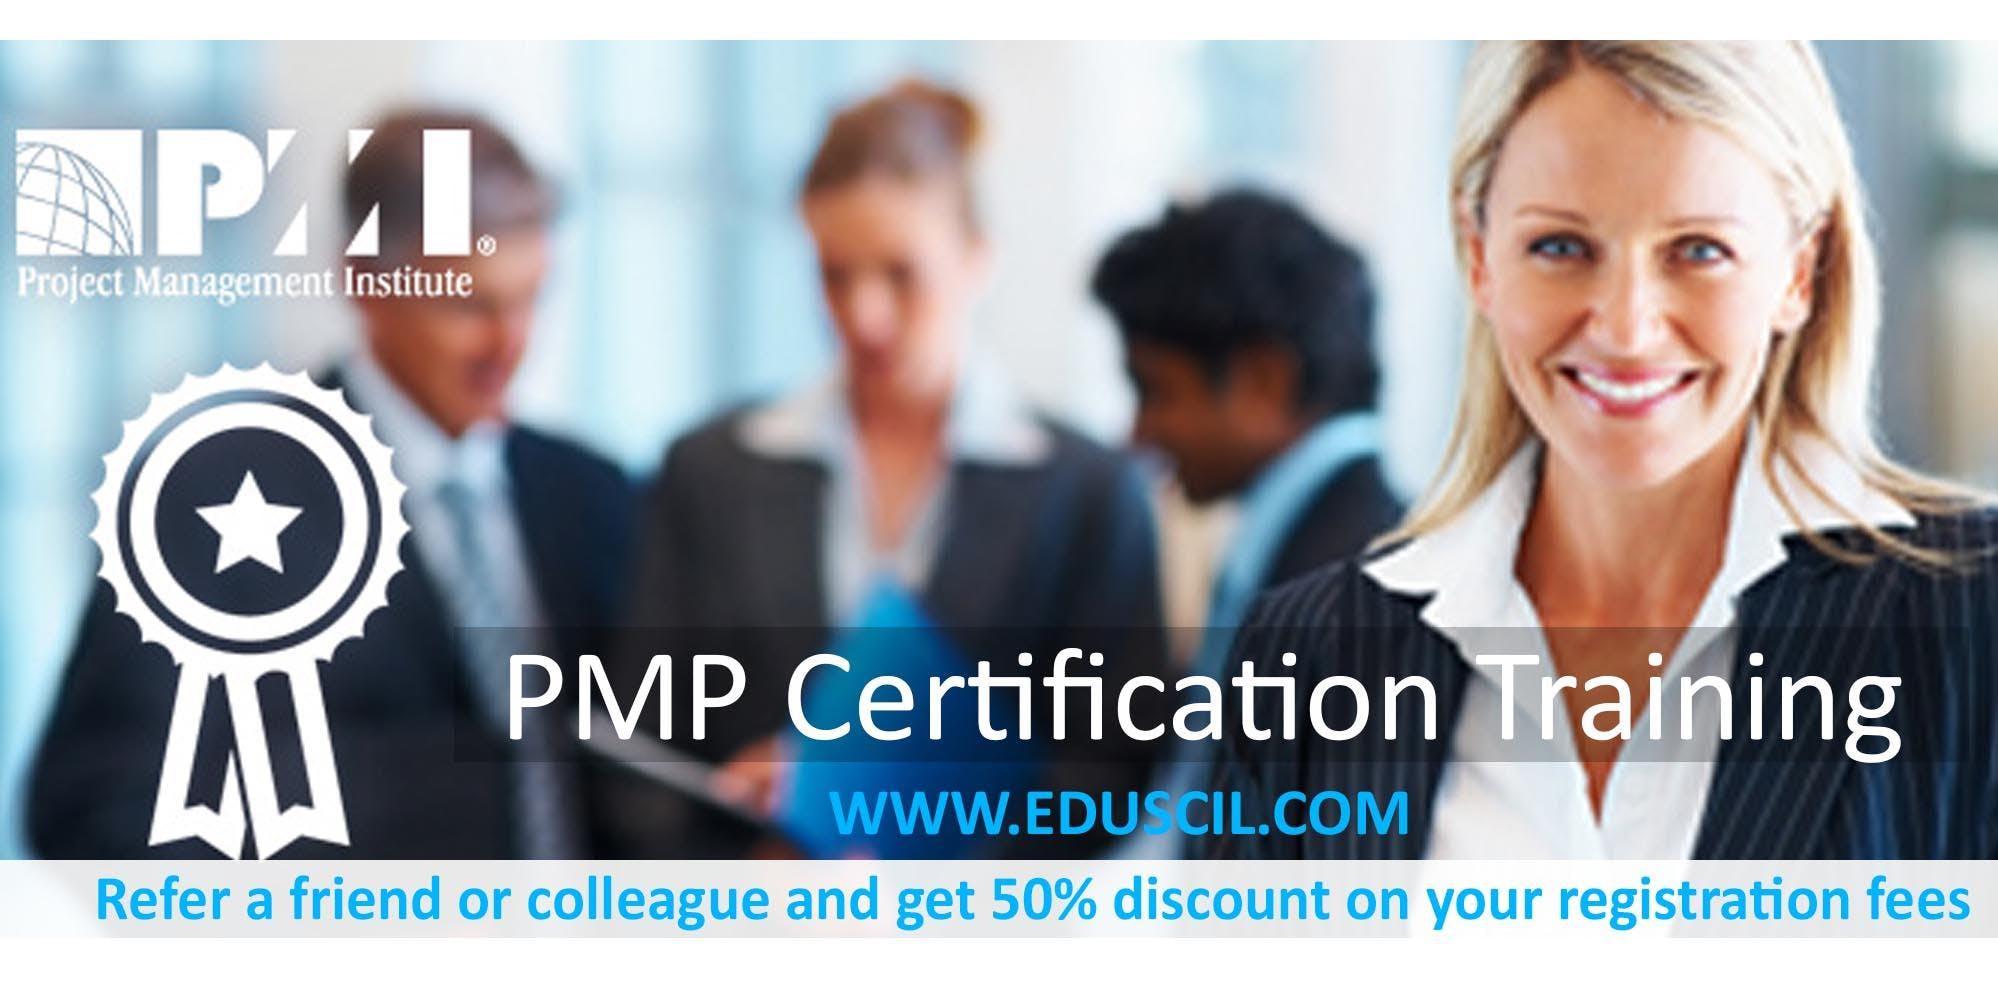 4 Days Pmp Classroom Training At Umlazi South Africa Eduscil Umlazi